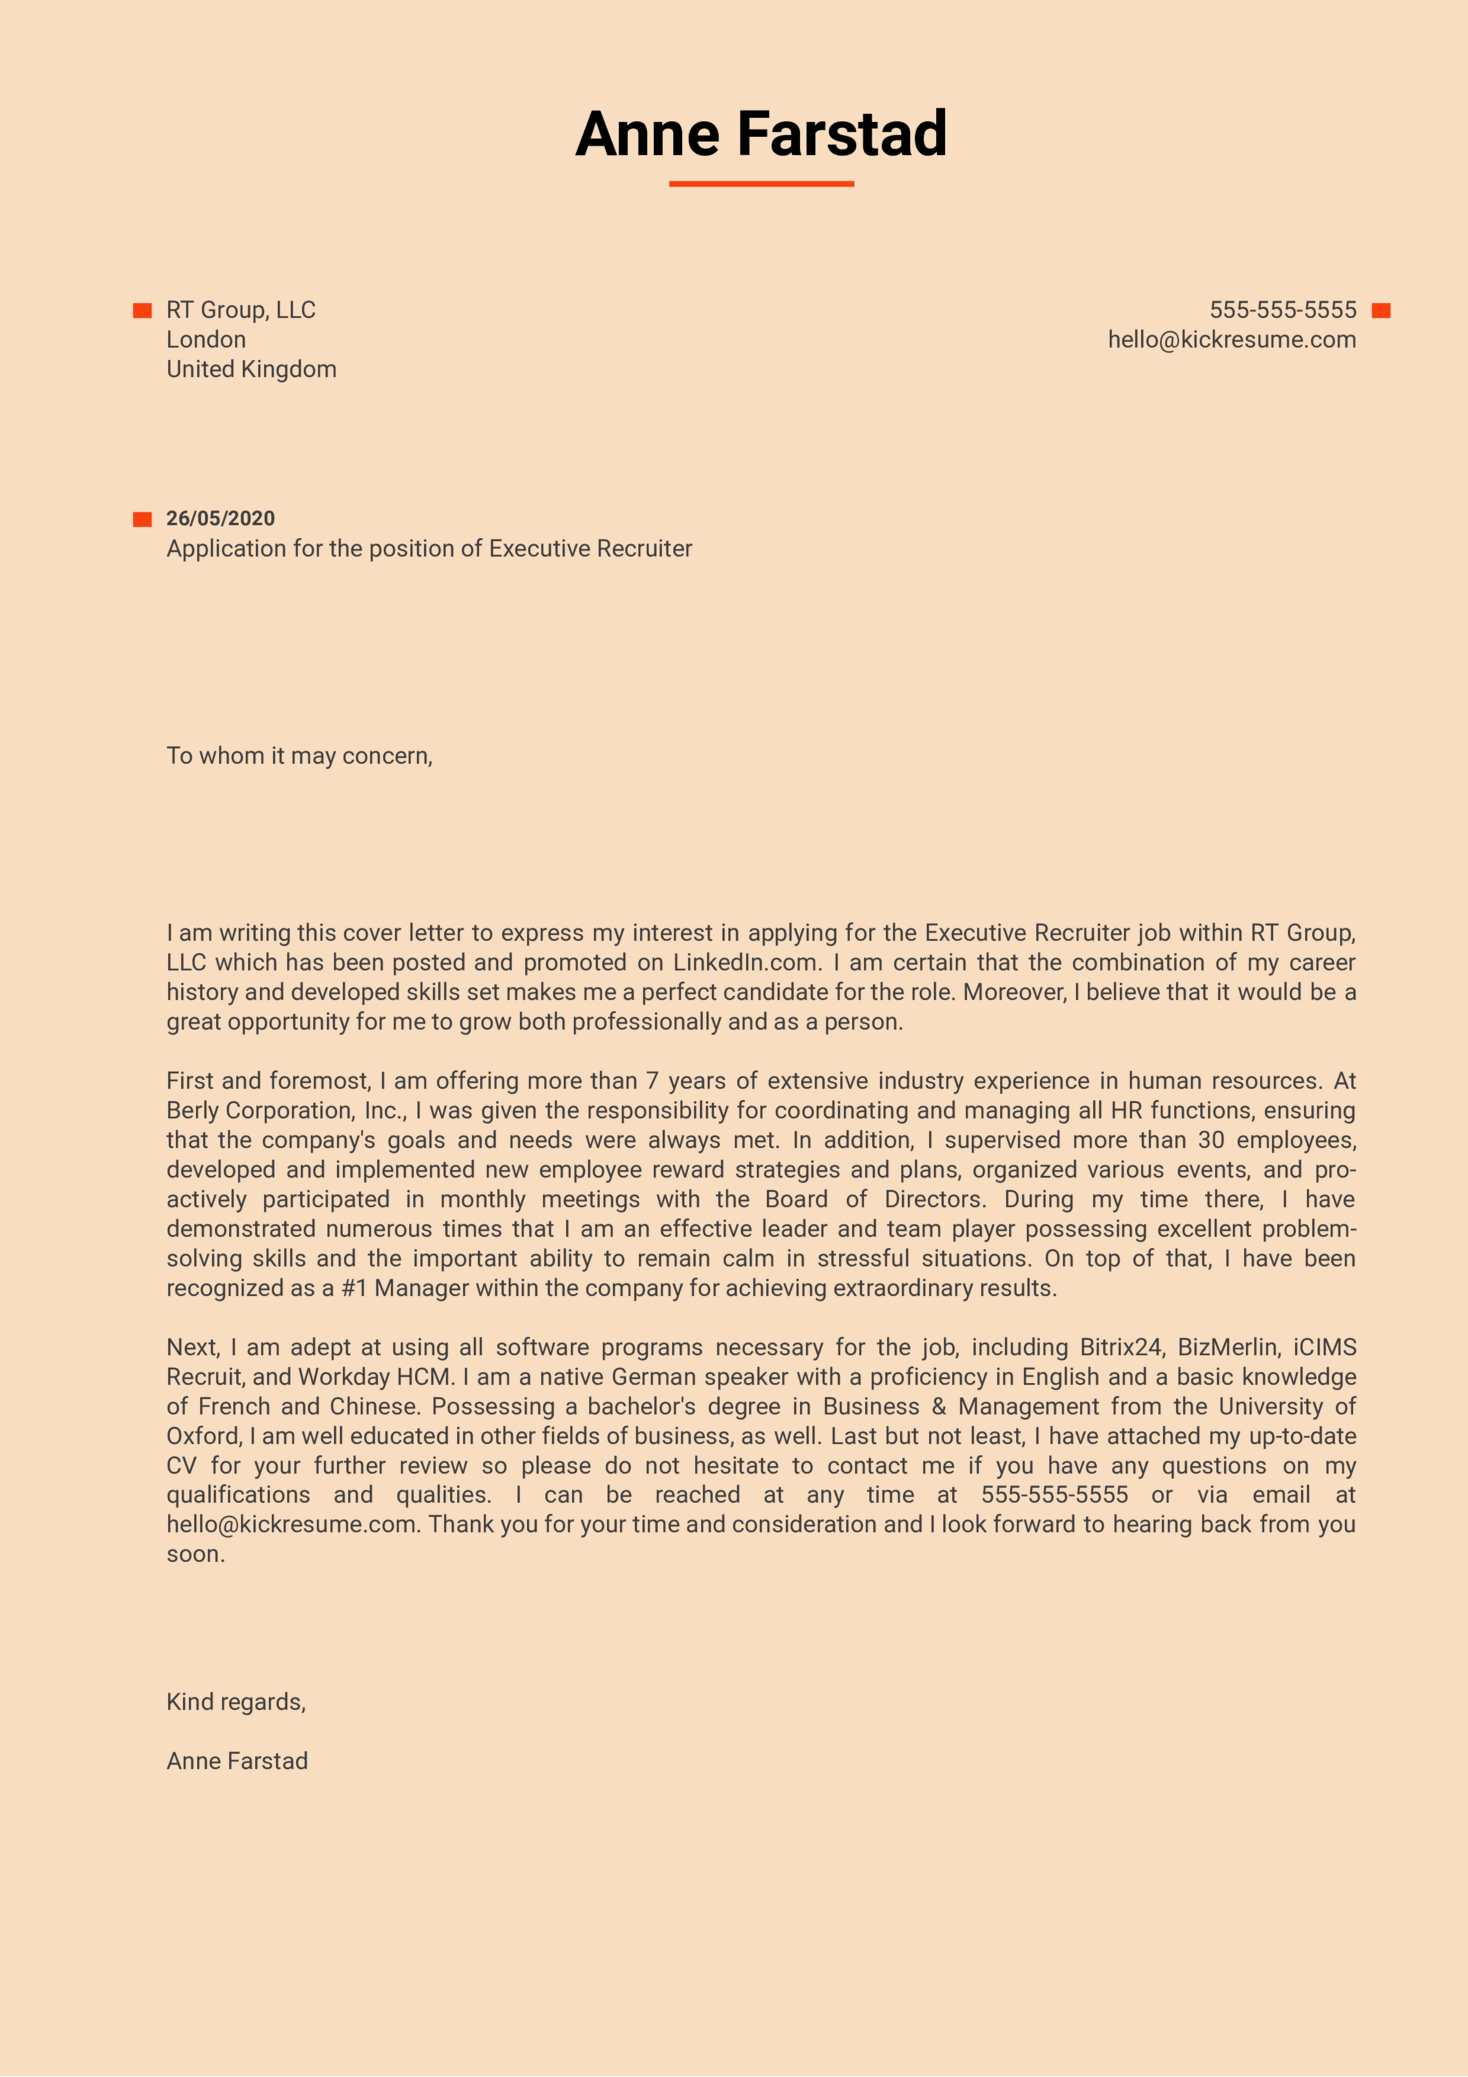 Executive Recruiter Cover Letter Sample Kickresume